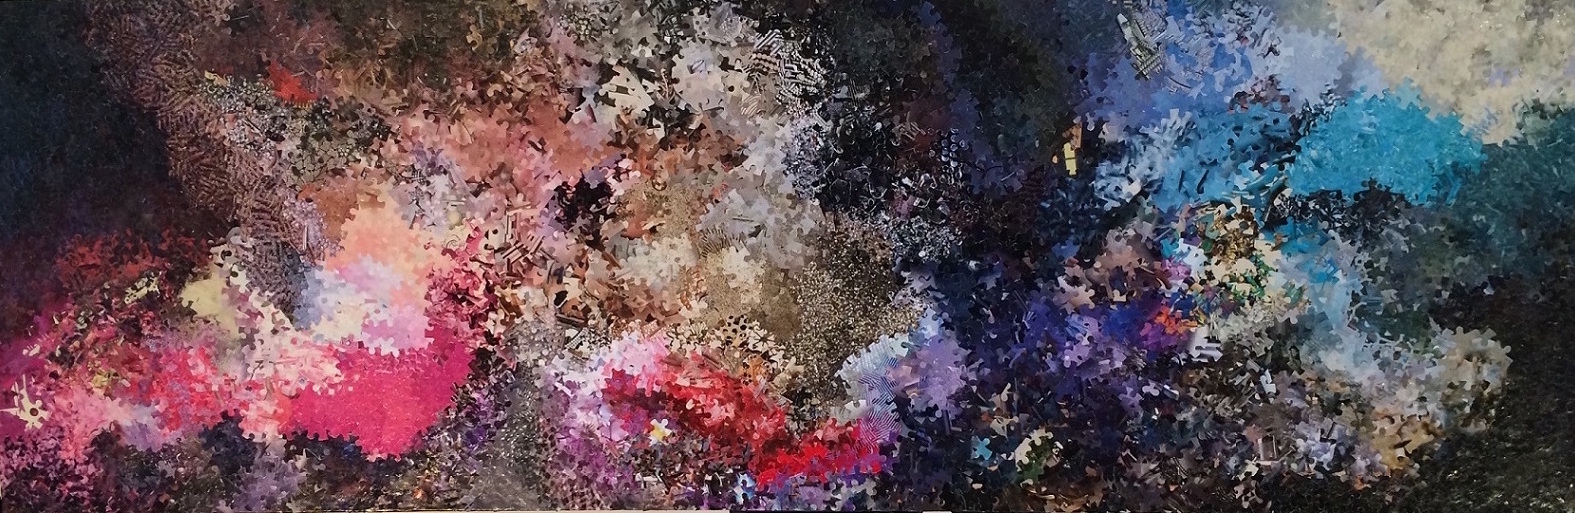 "Girl Meets Boy | 2015 | 45"" x 15"" | Paper, Resin, Canvas"